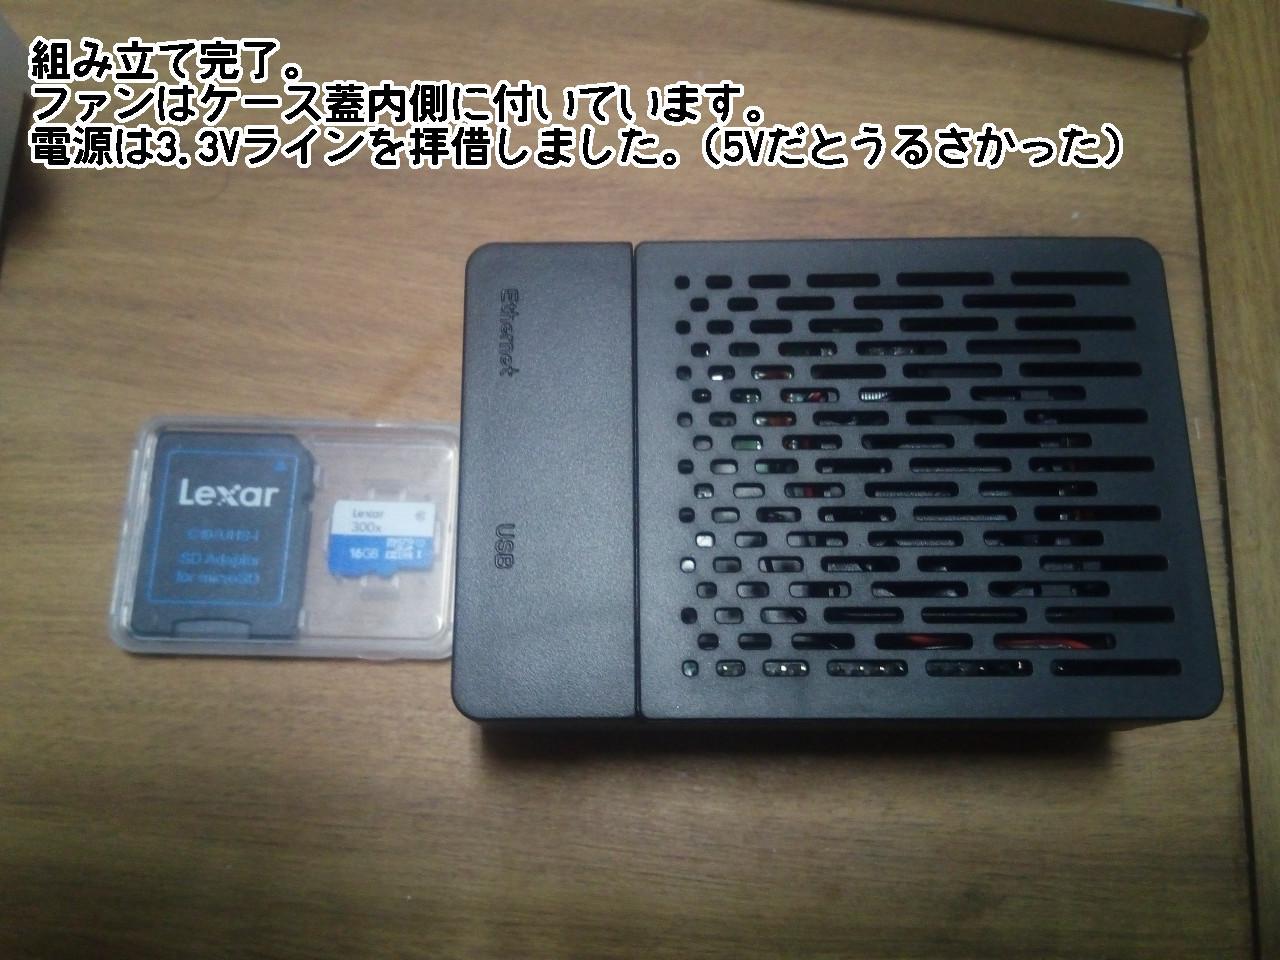 RaspberryPi3B+購入